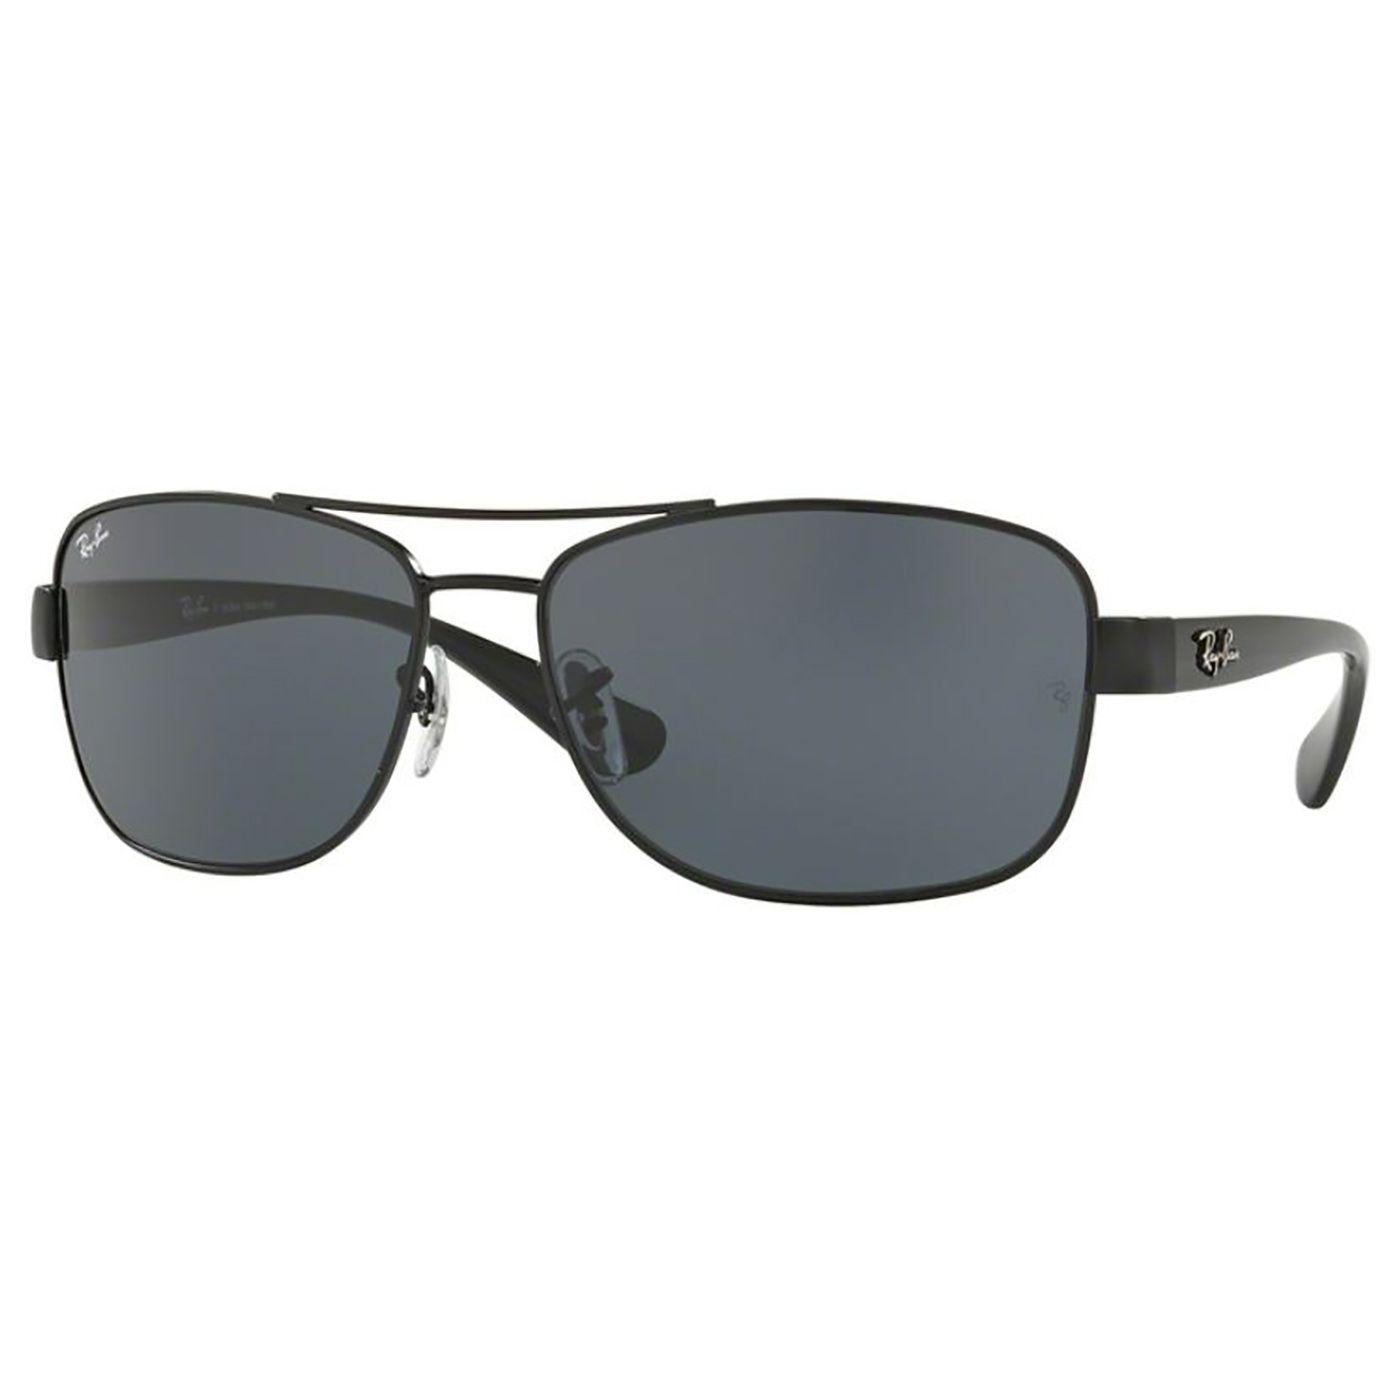 Óculos de Sol Masculino Ray Ban RB3518L Metal Preto Brilho Grande